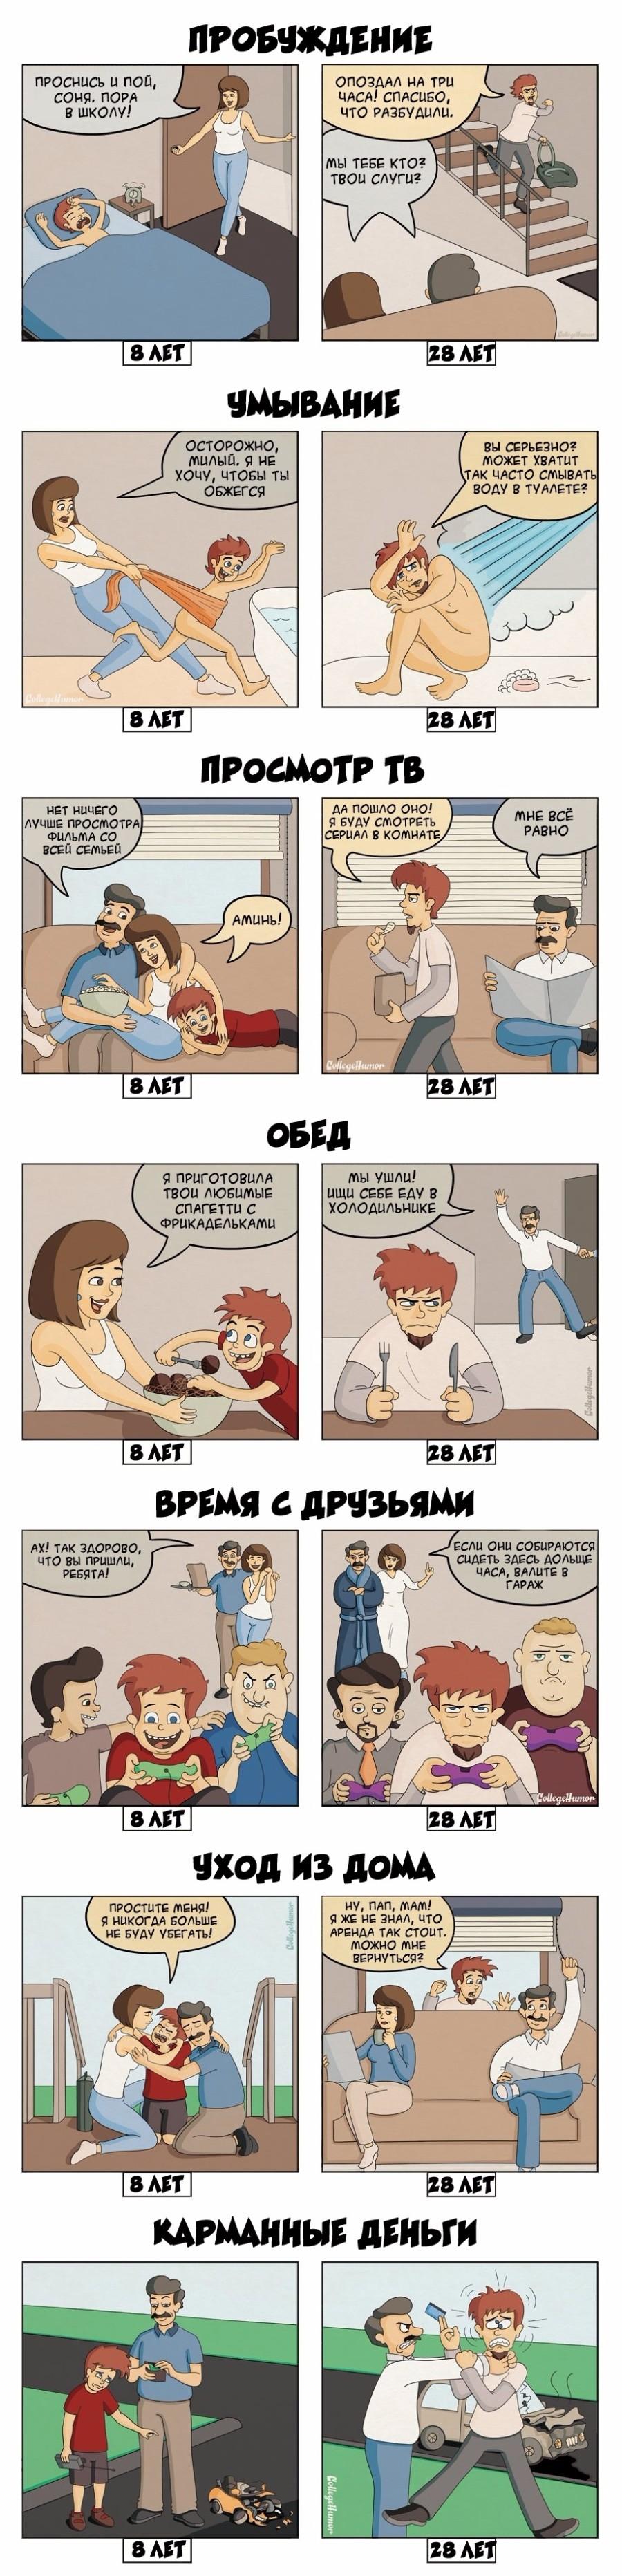 Разница в возрасте